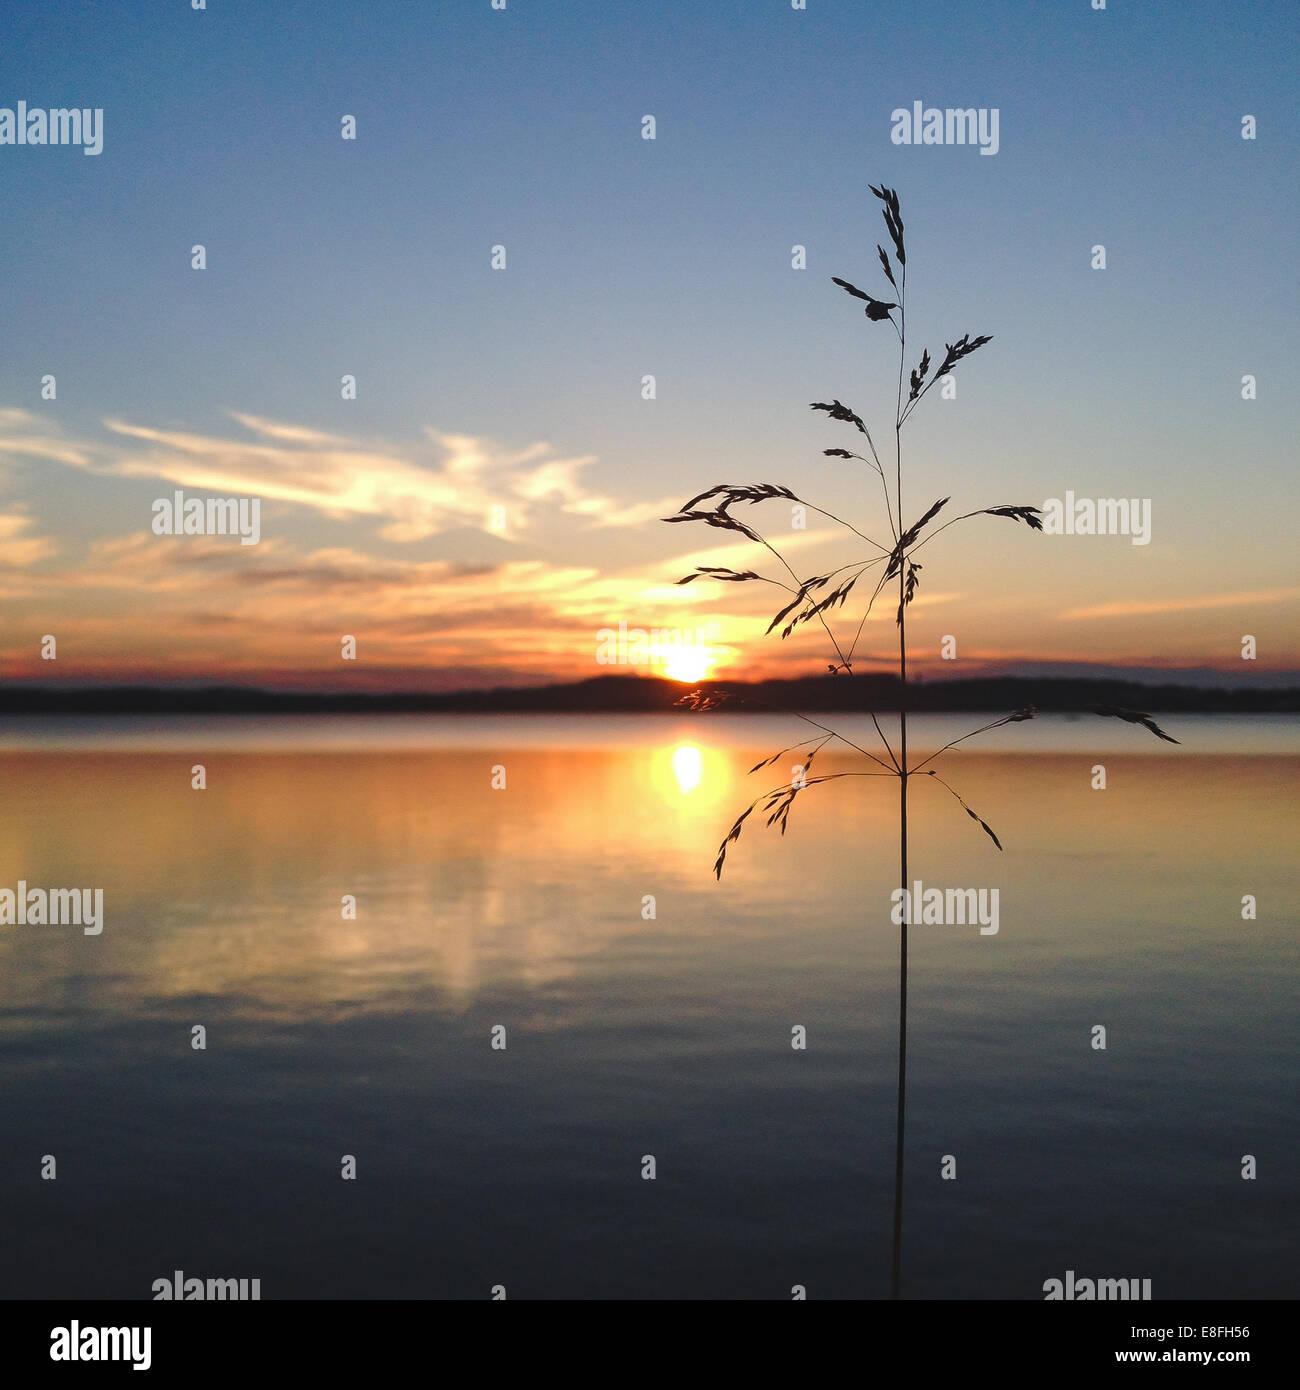 Wild grass at sunset - Stock Image